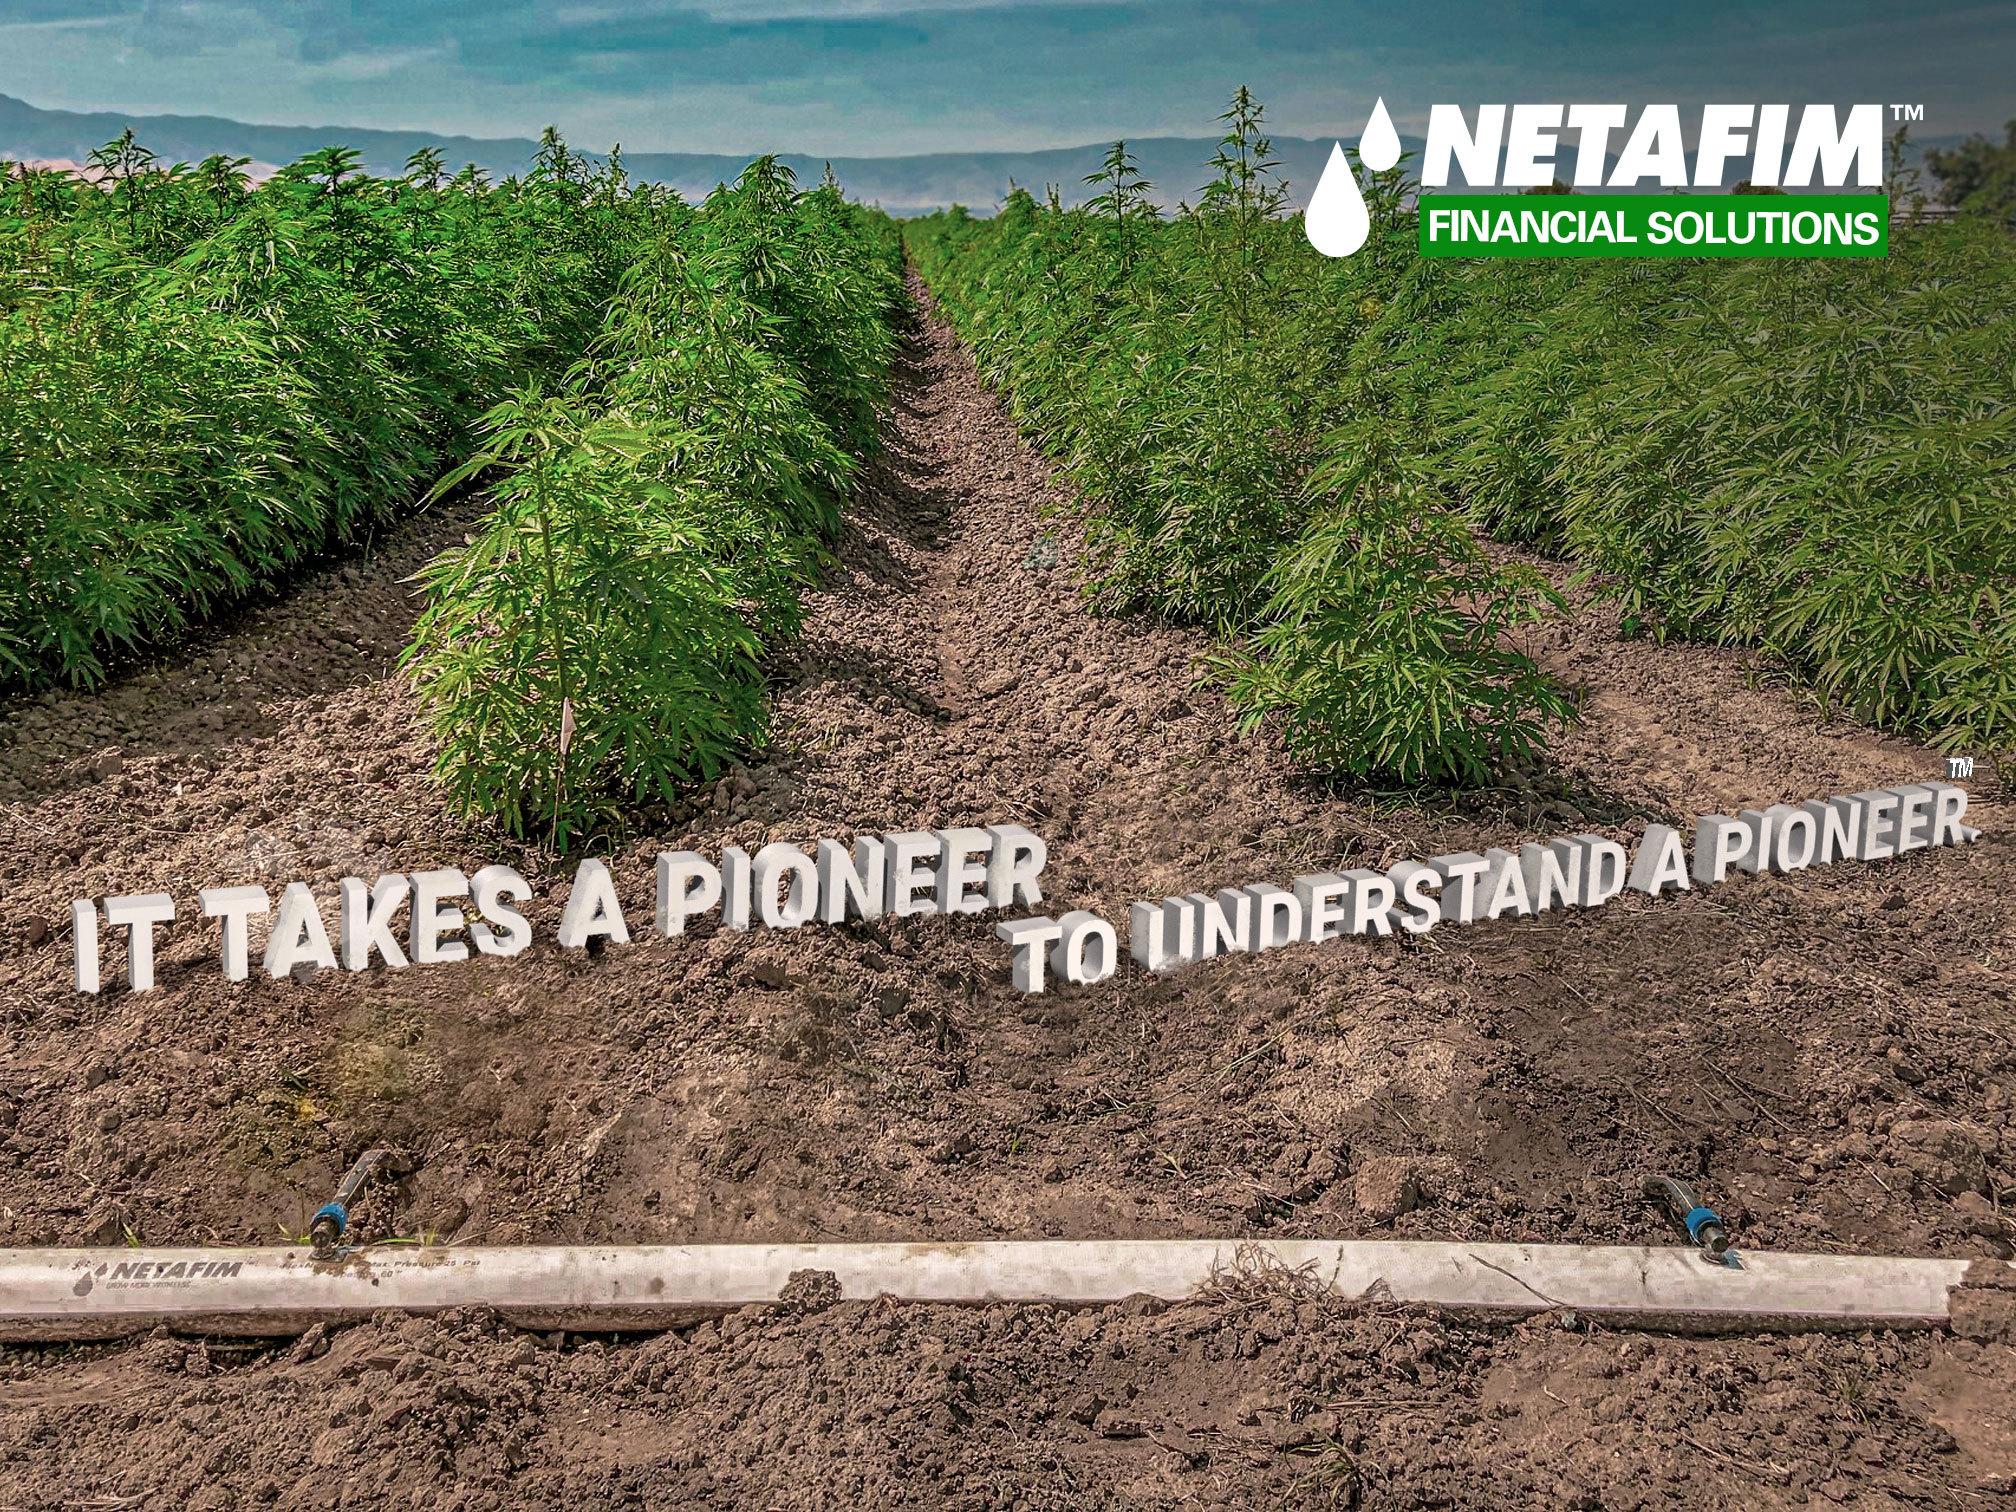 Netafim Financial Solutions Expands Drip Irrigation System Financing Program To Include Hemp Growers Business Wire